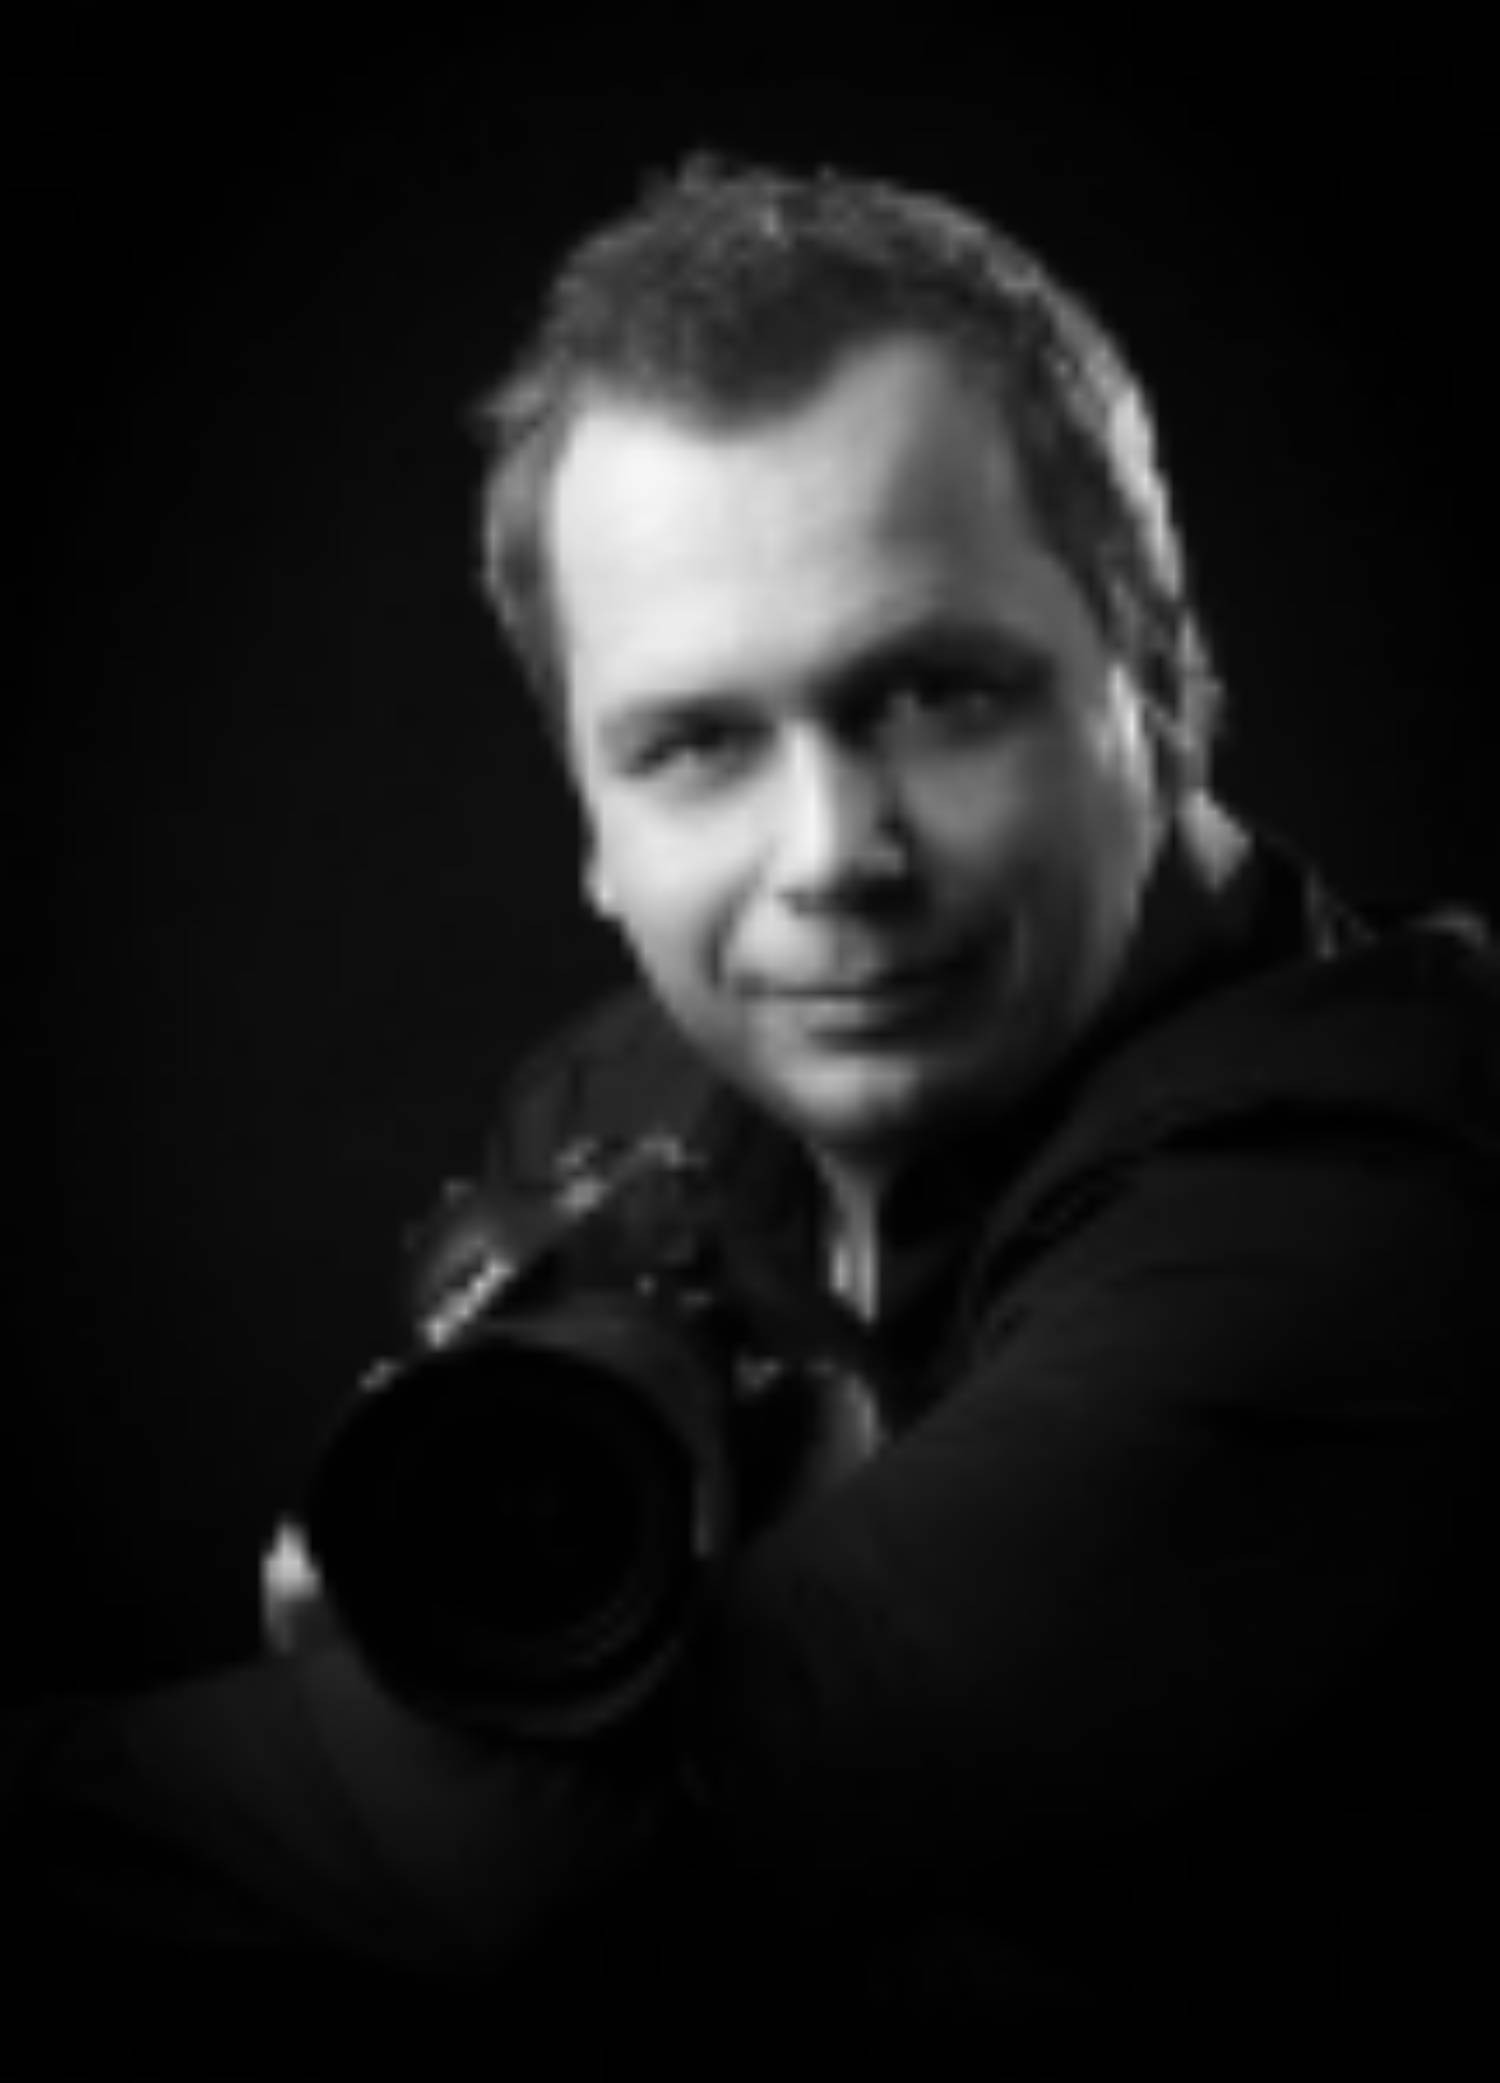 Lidi, emoce a vztahy na fotografiích Daniela Šeinera